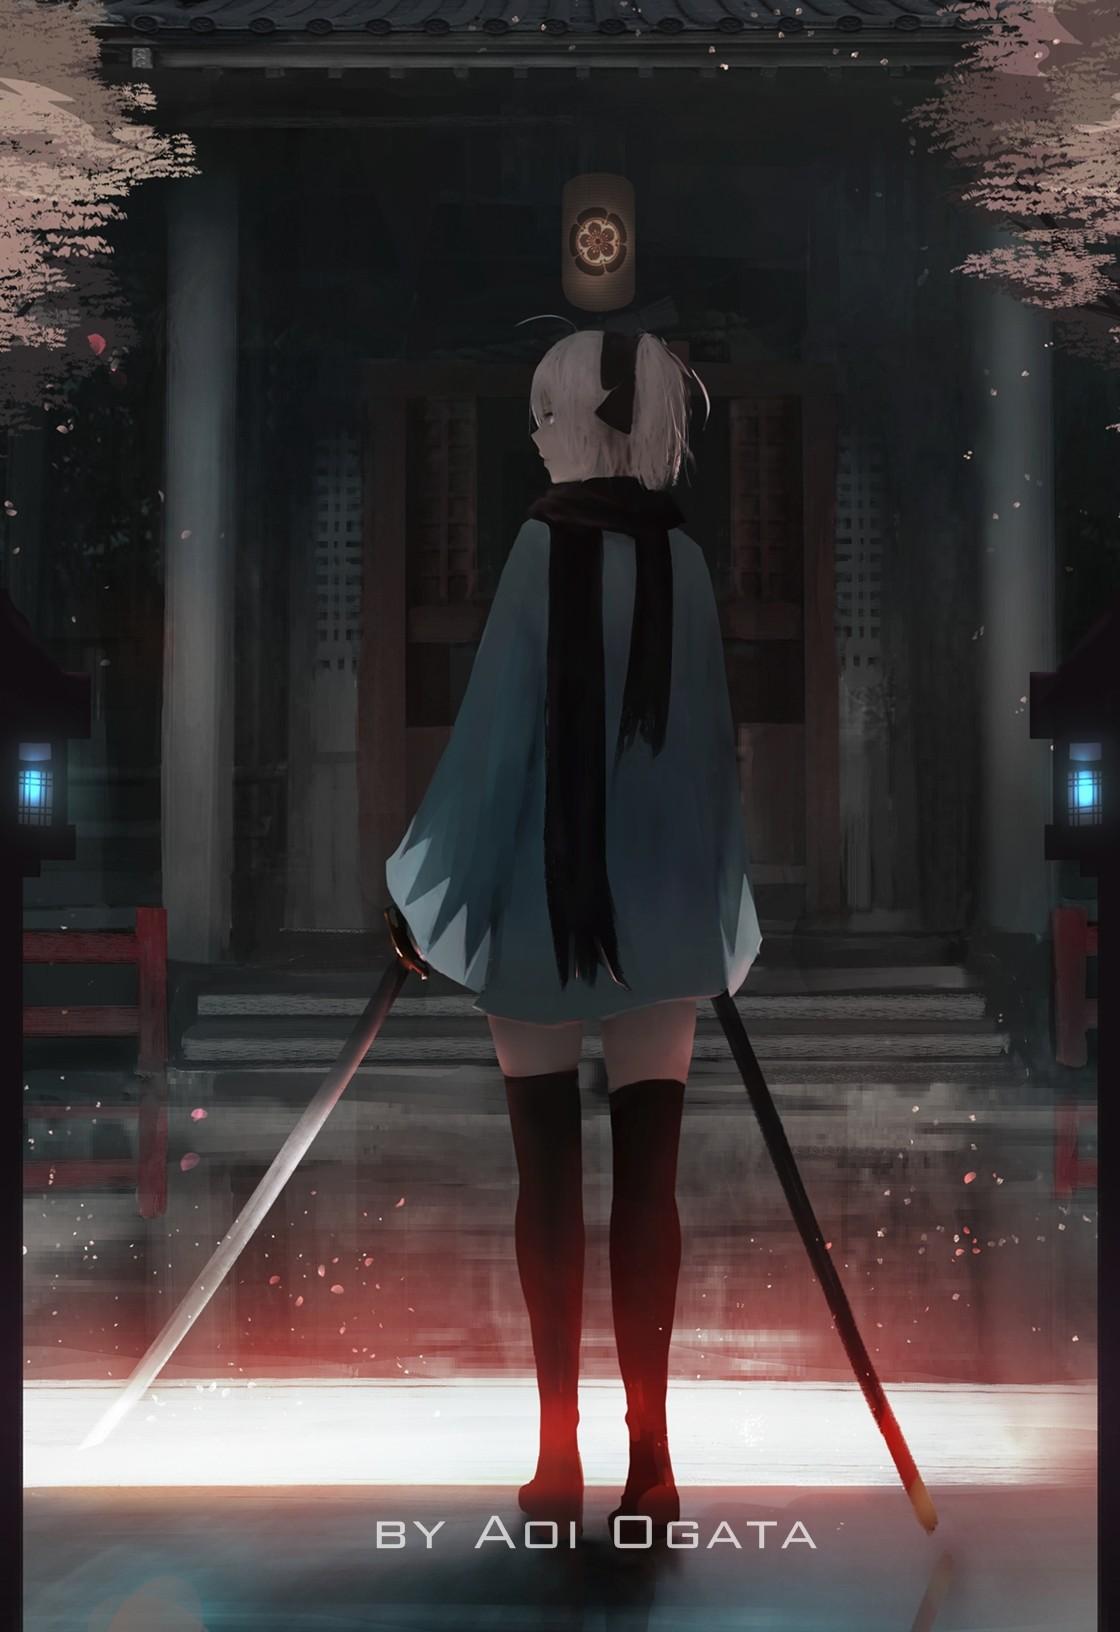 Aoi ogata okita1